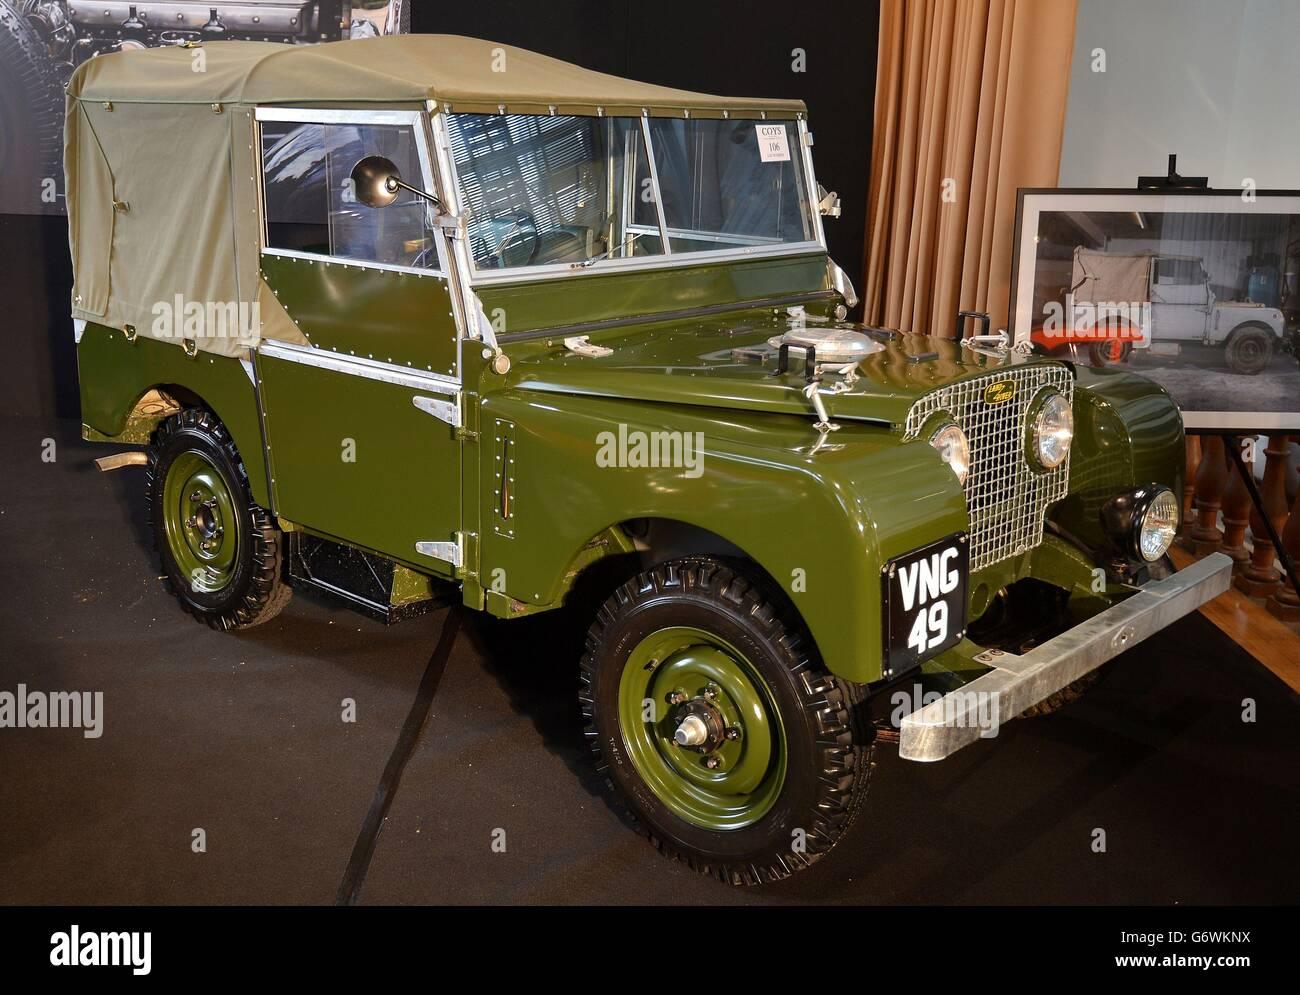 Vintage cars auction Stock Photo: 107514454 - Alamy